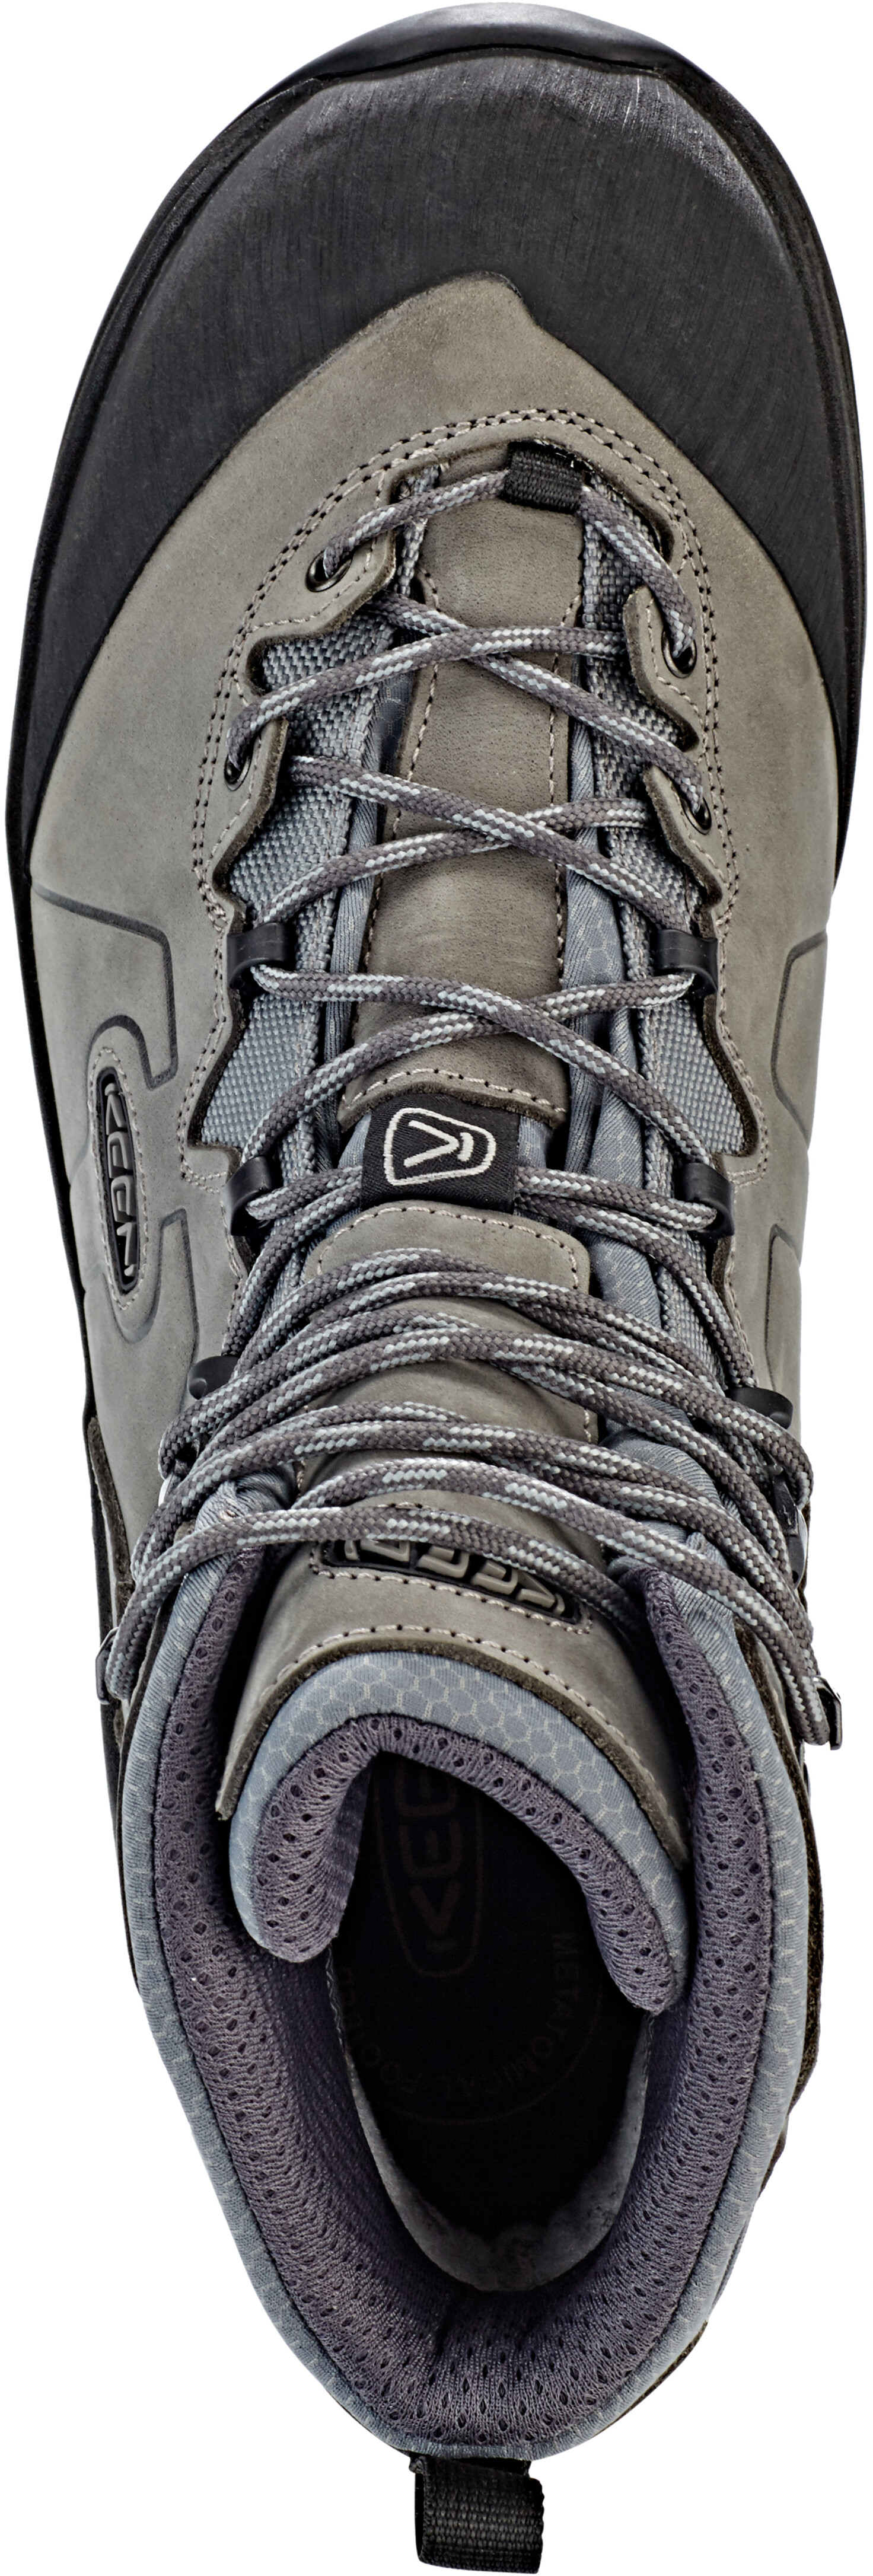 c4bd1cfa077 Keen Karraig WP Mid Shoes Men bungee cord/green gables